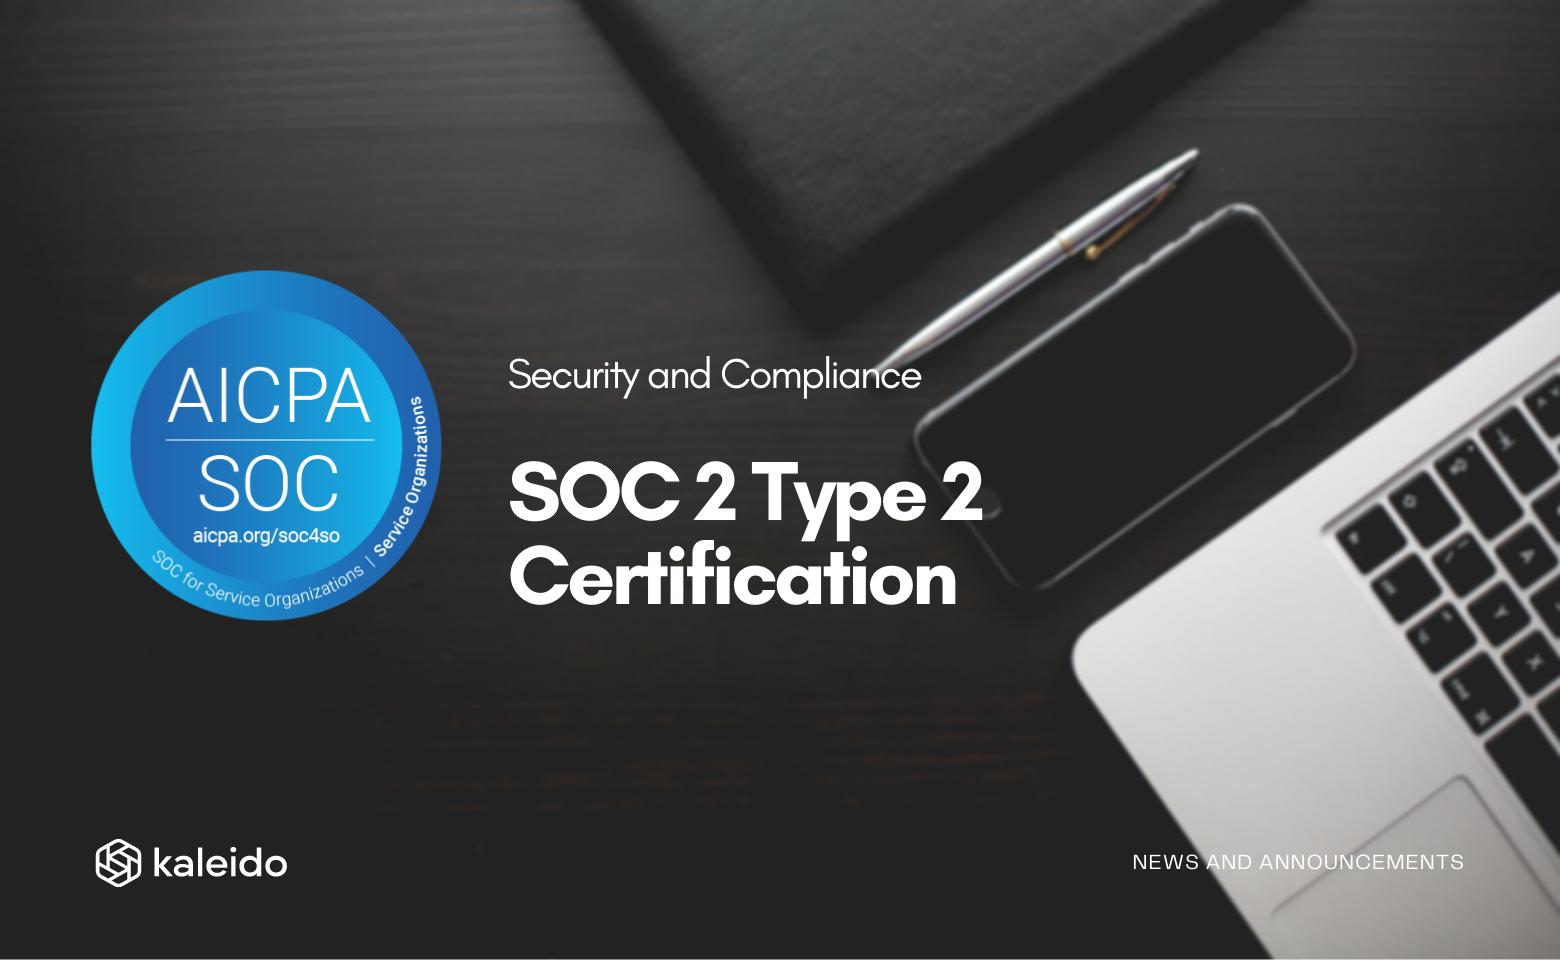 Kaleido Achieves SOC 2 Type 2 Certification